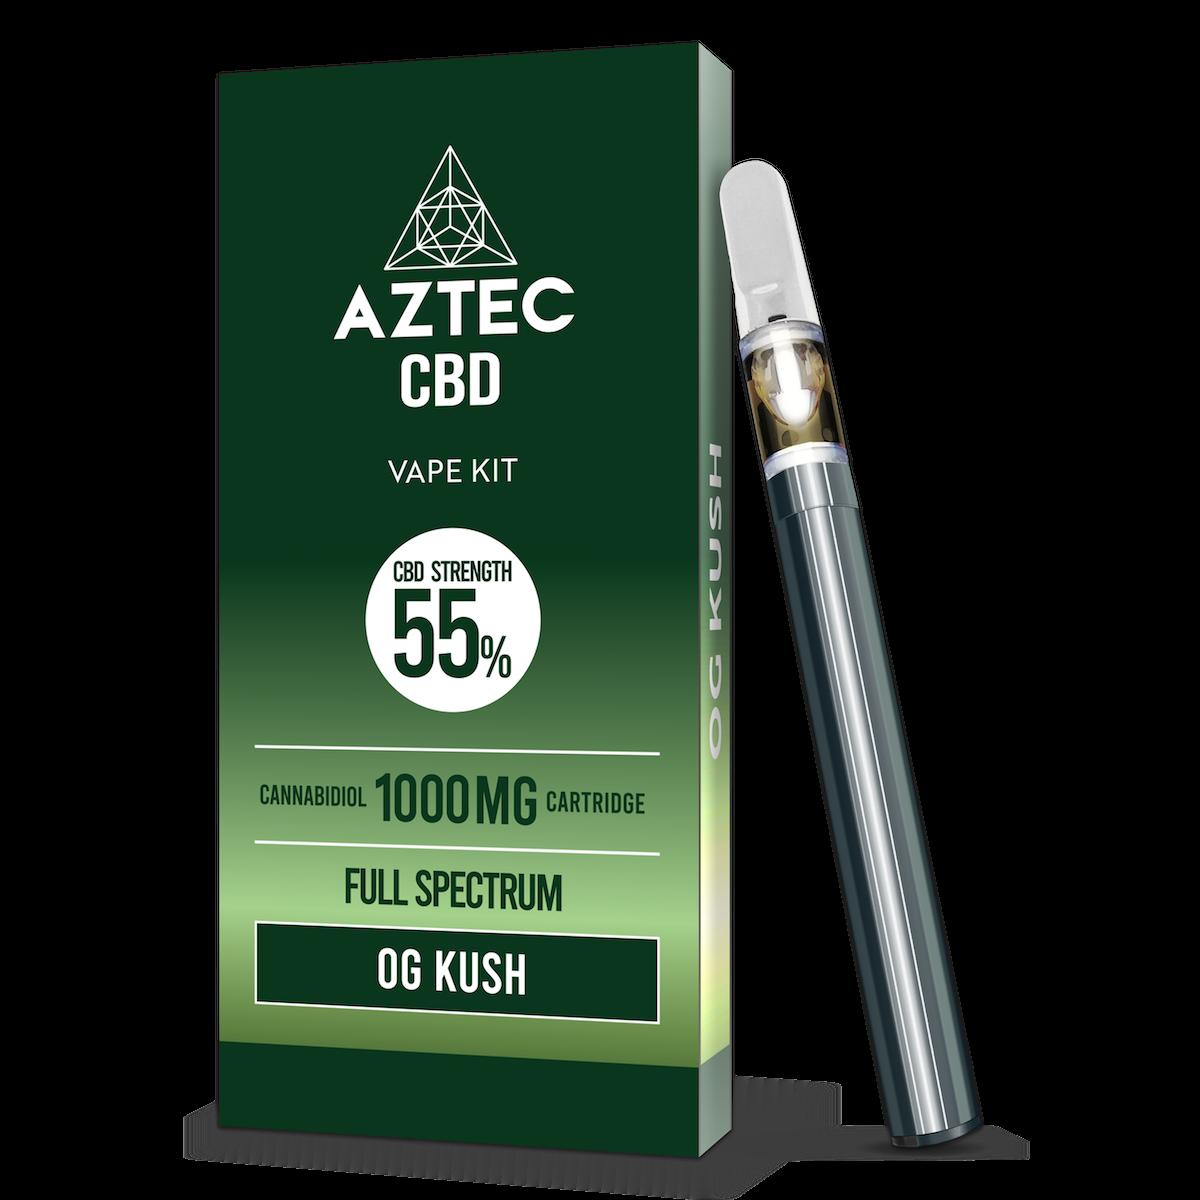 Aztec O.G Kush 55% CBD Vaping Kit